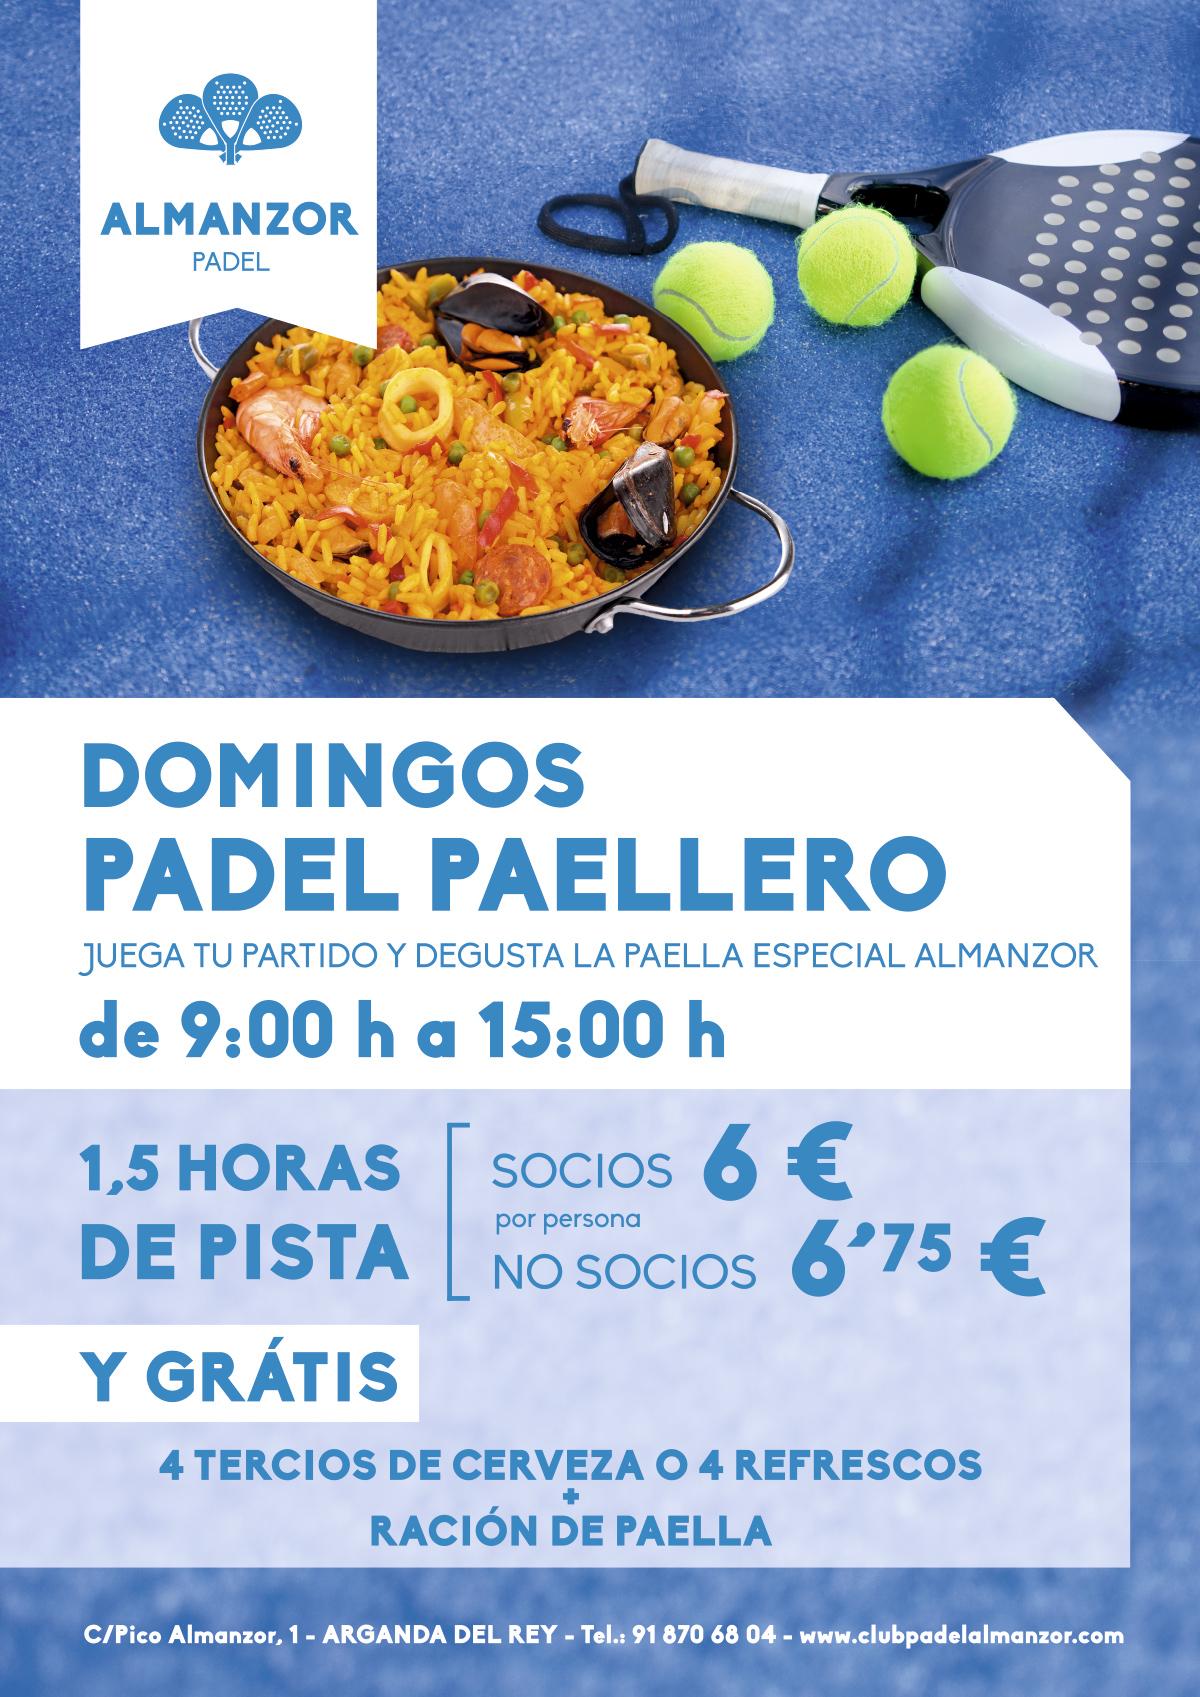 DomingosPaelleros